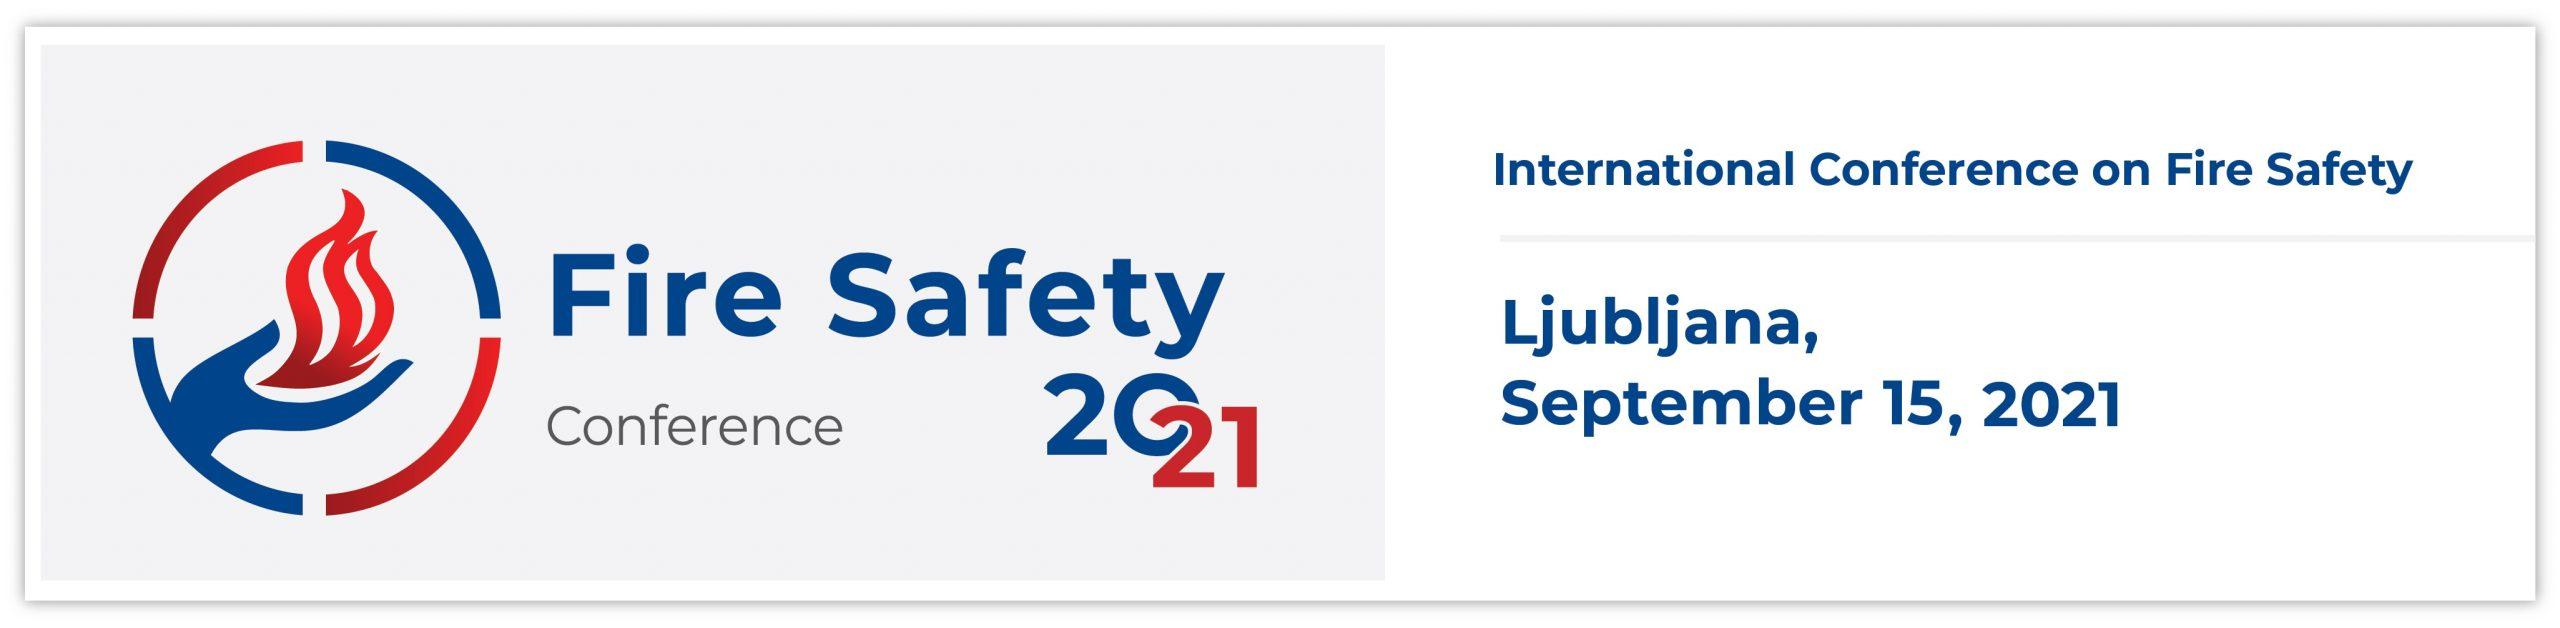 Mednarodna konferenca Fire Safety Conference & Expo